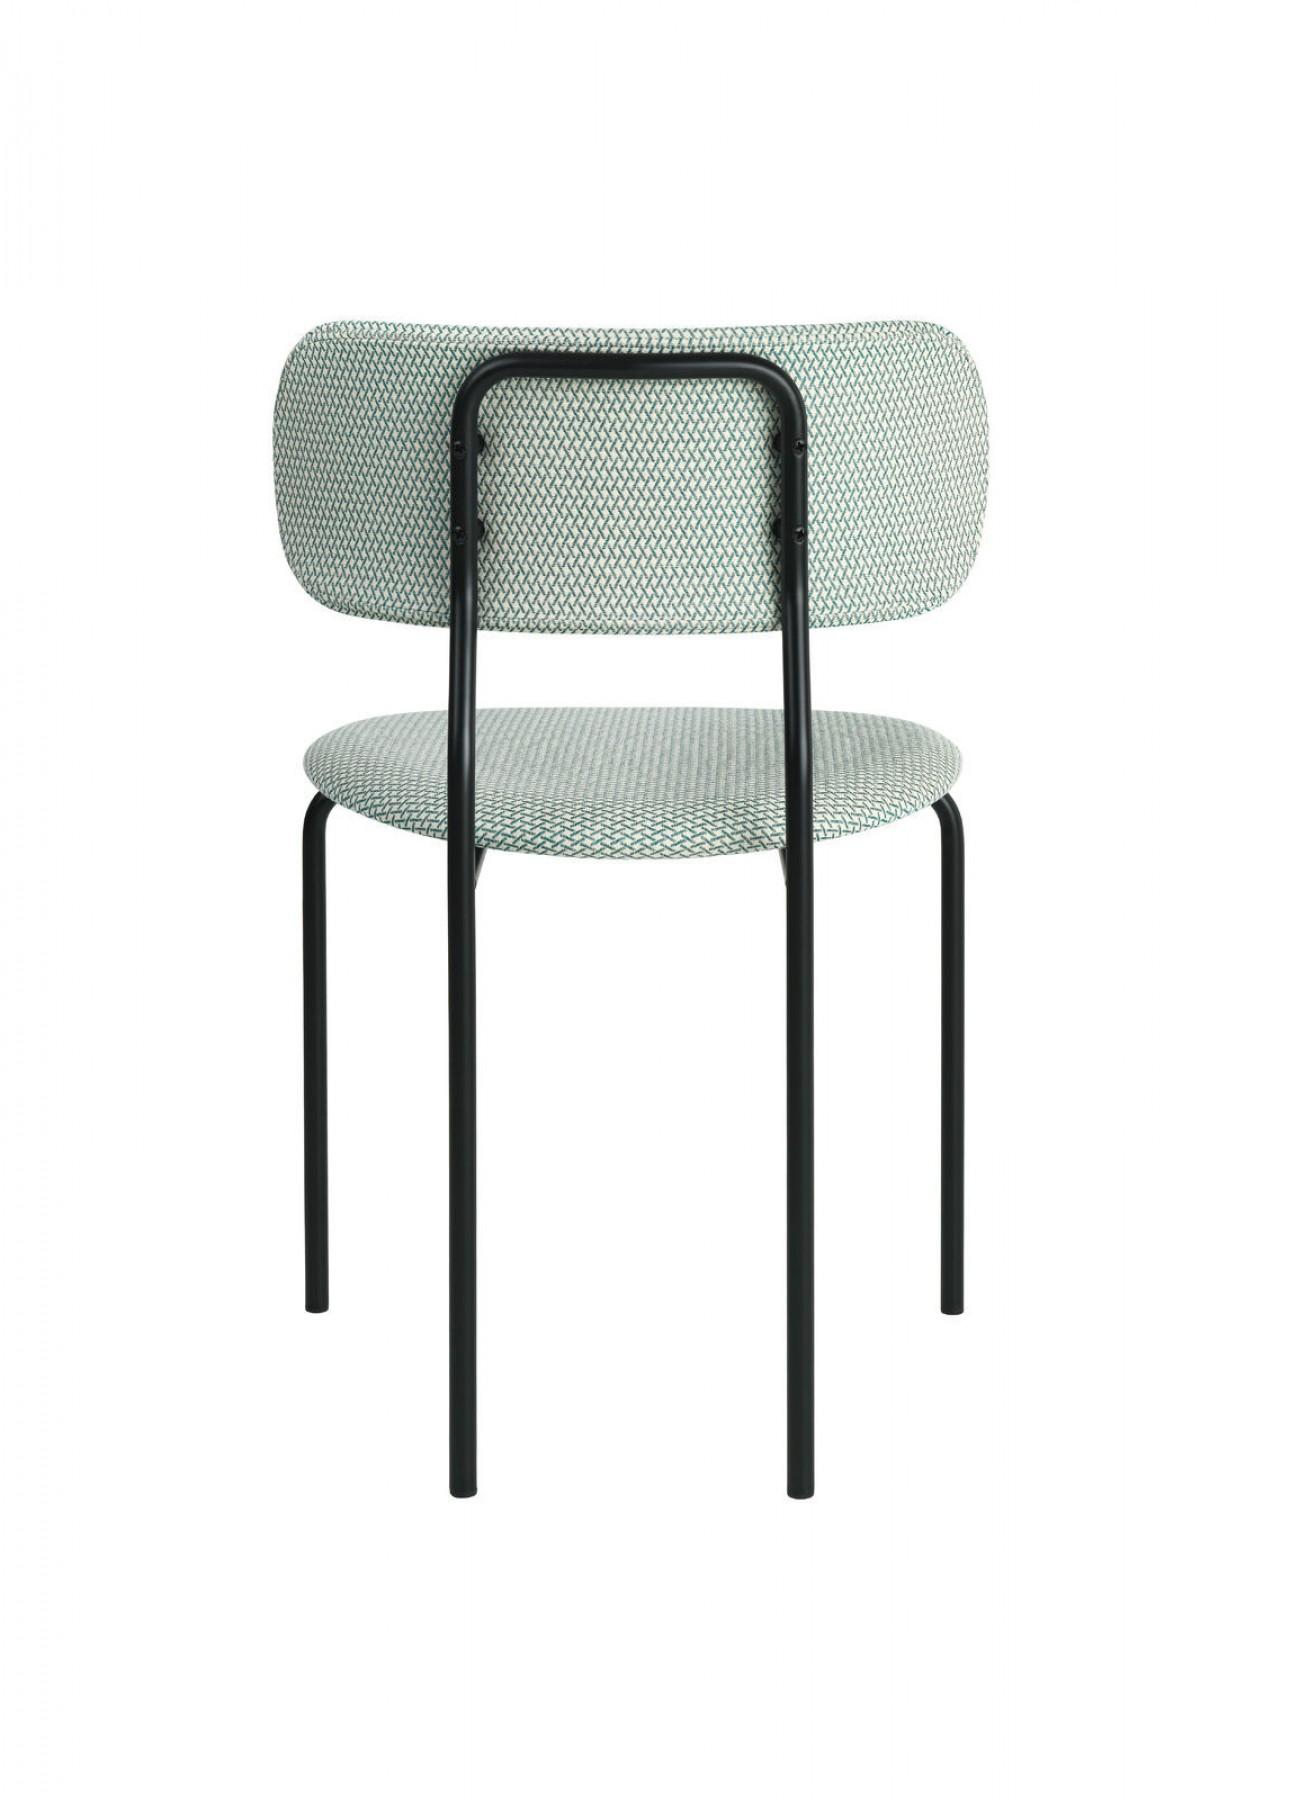 Achterkant Coco chair, OEO design, Gubi collectie